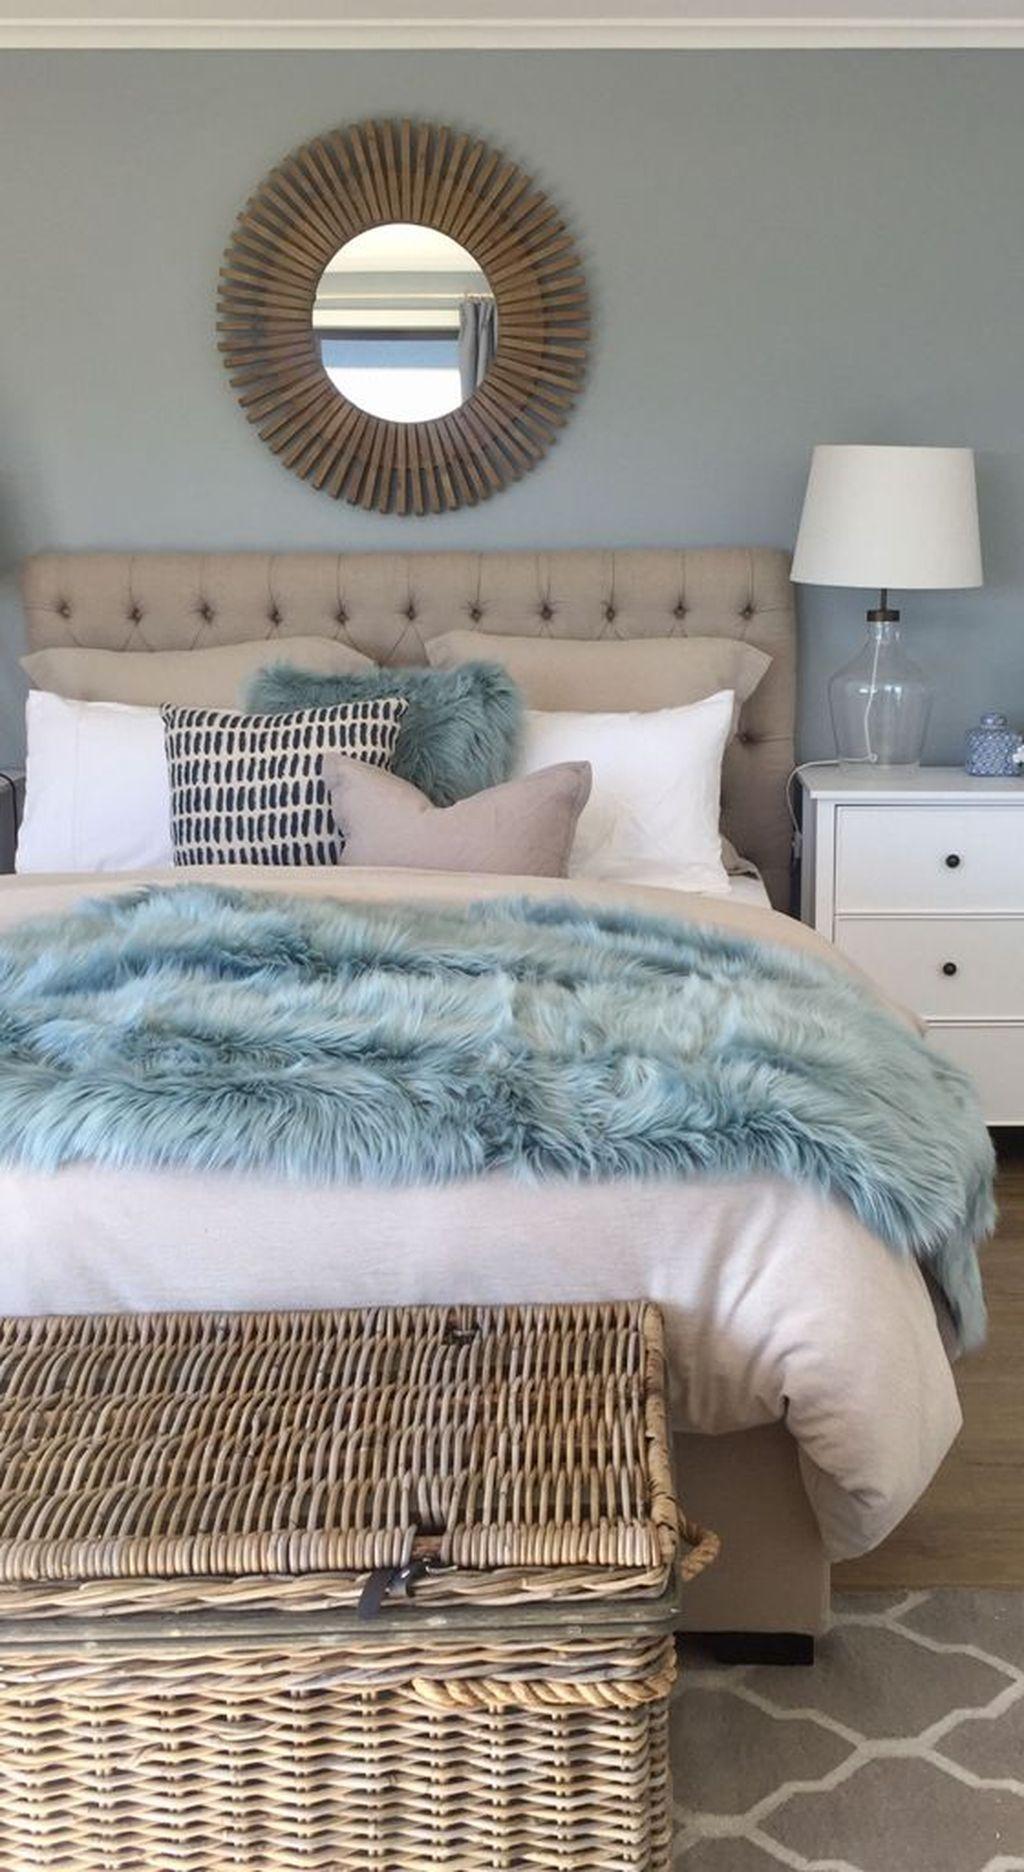 Pin By Suki Royer On Bedroom Ideas Coastal Bedroom Decorating